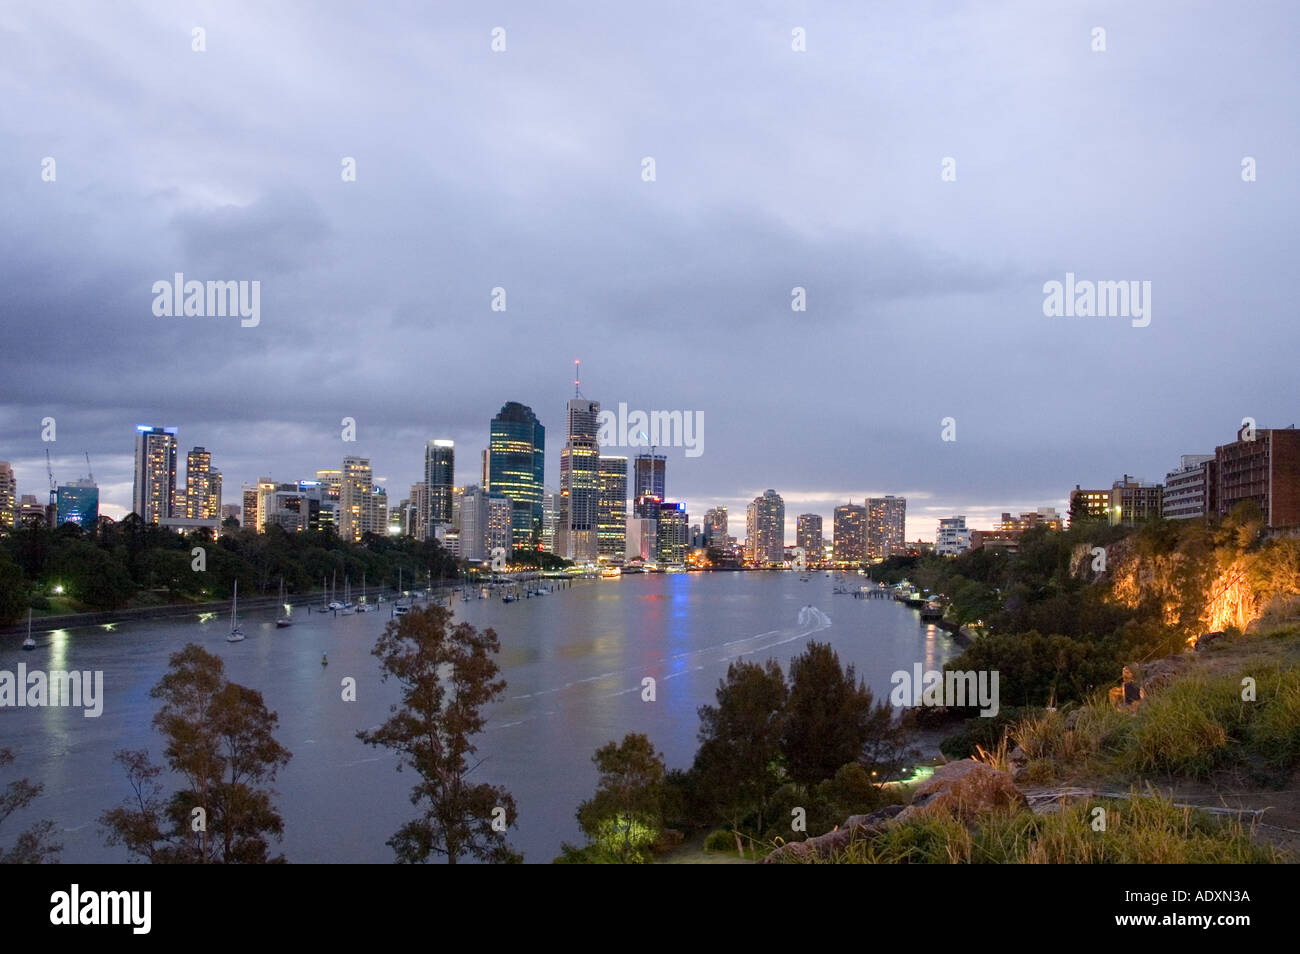 Brisbane at night 3751 - Stock Image